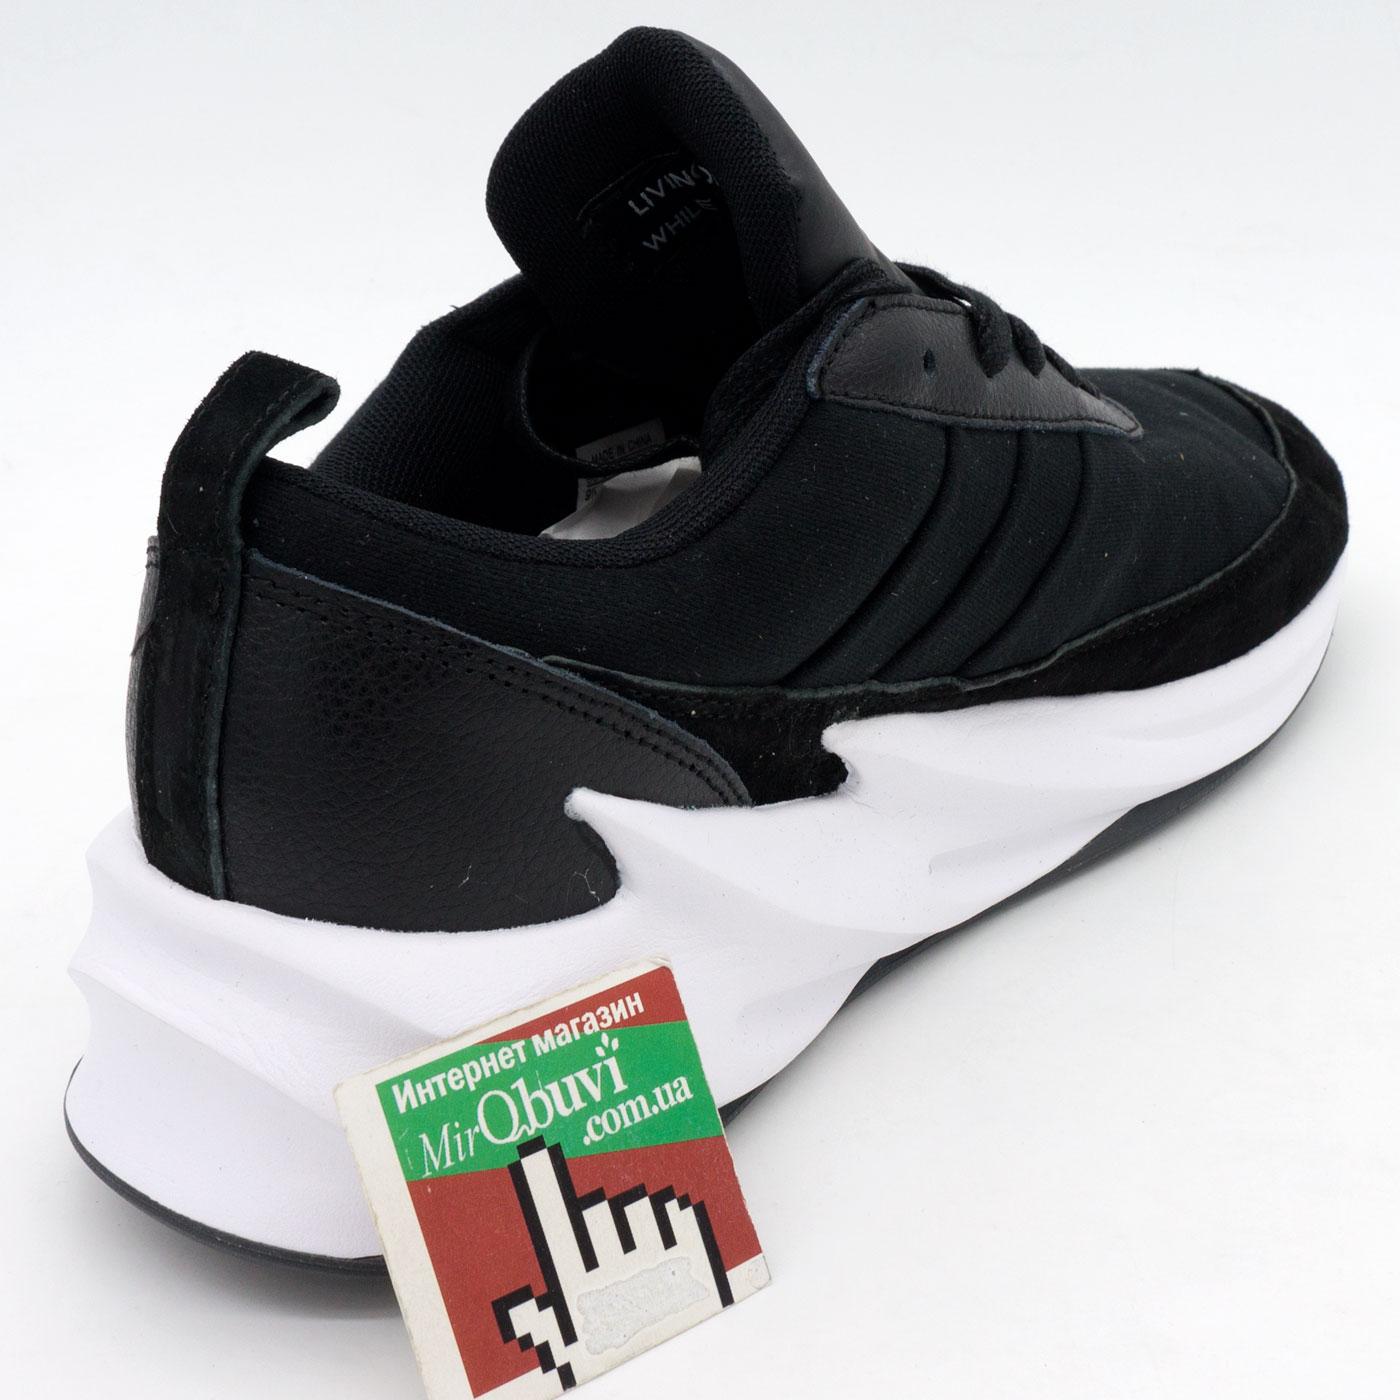 фото back Мужские кроссовки Adidas Sharks черно-белые. Топ качество! back